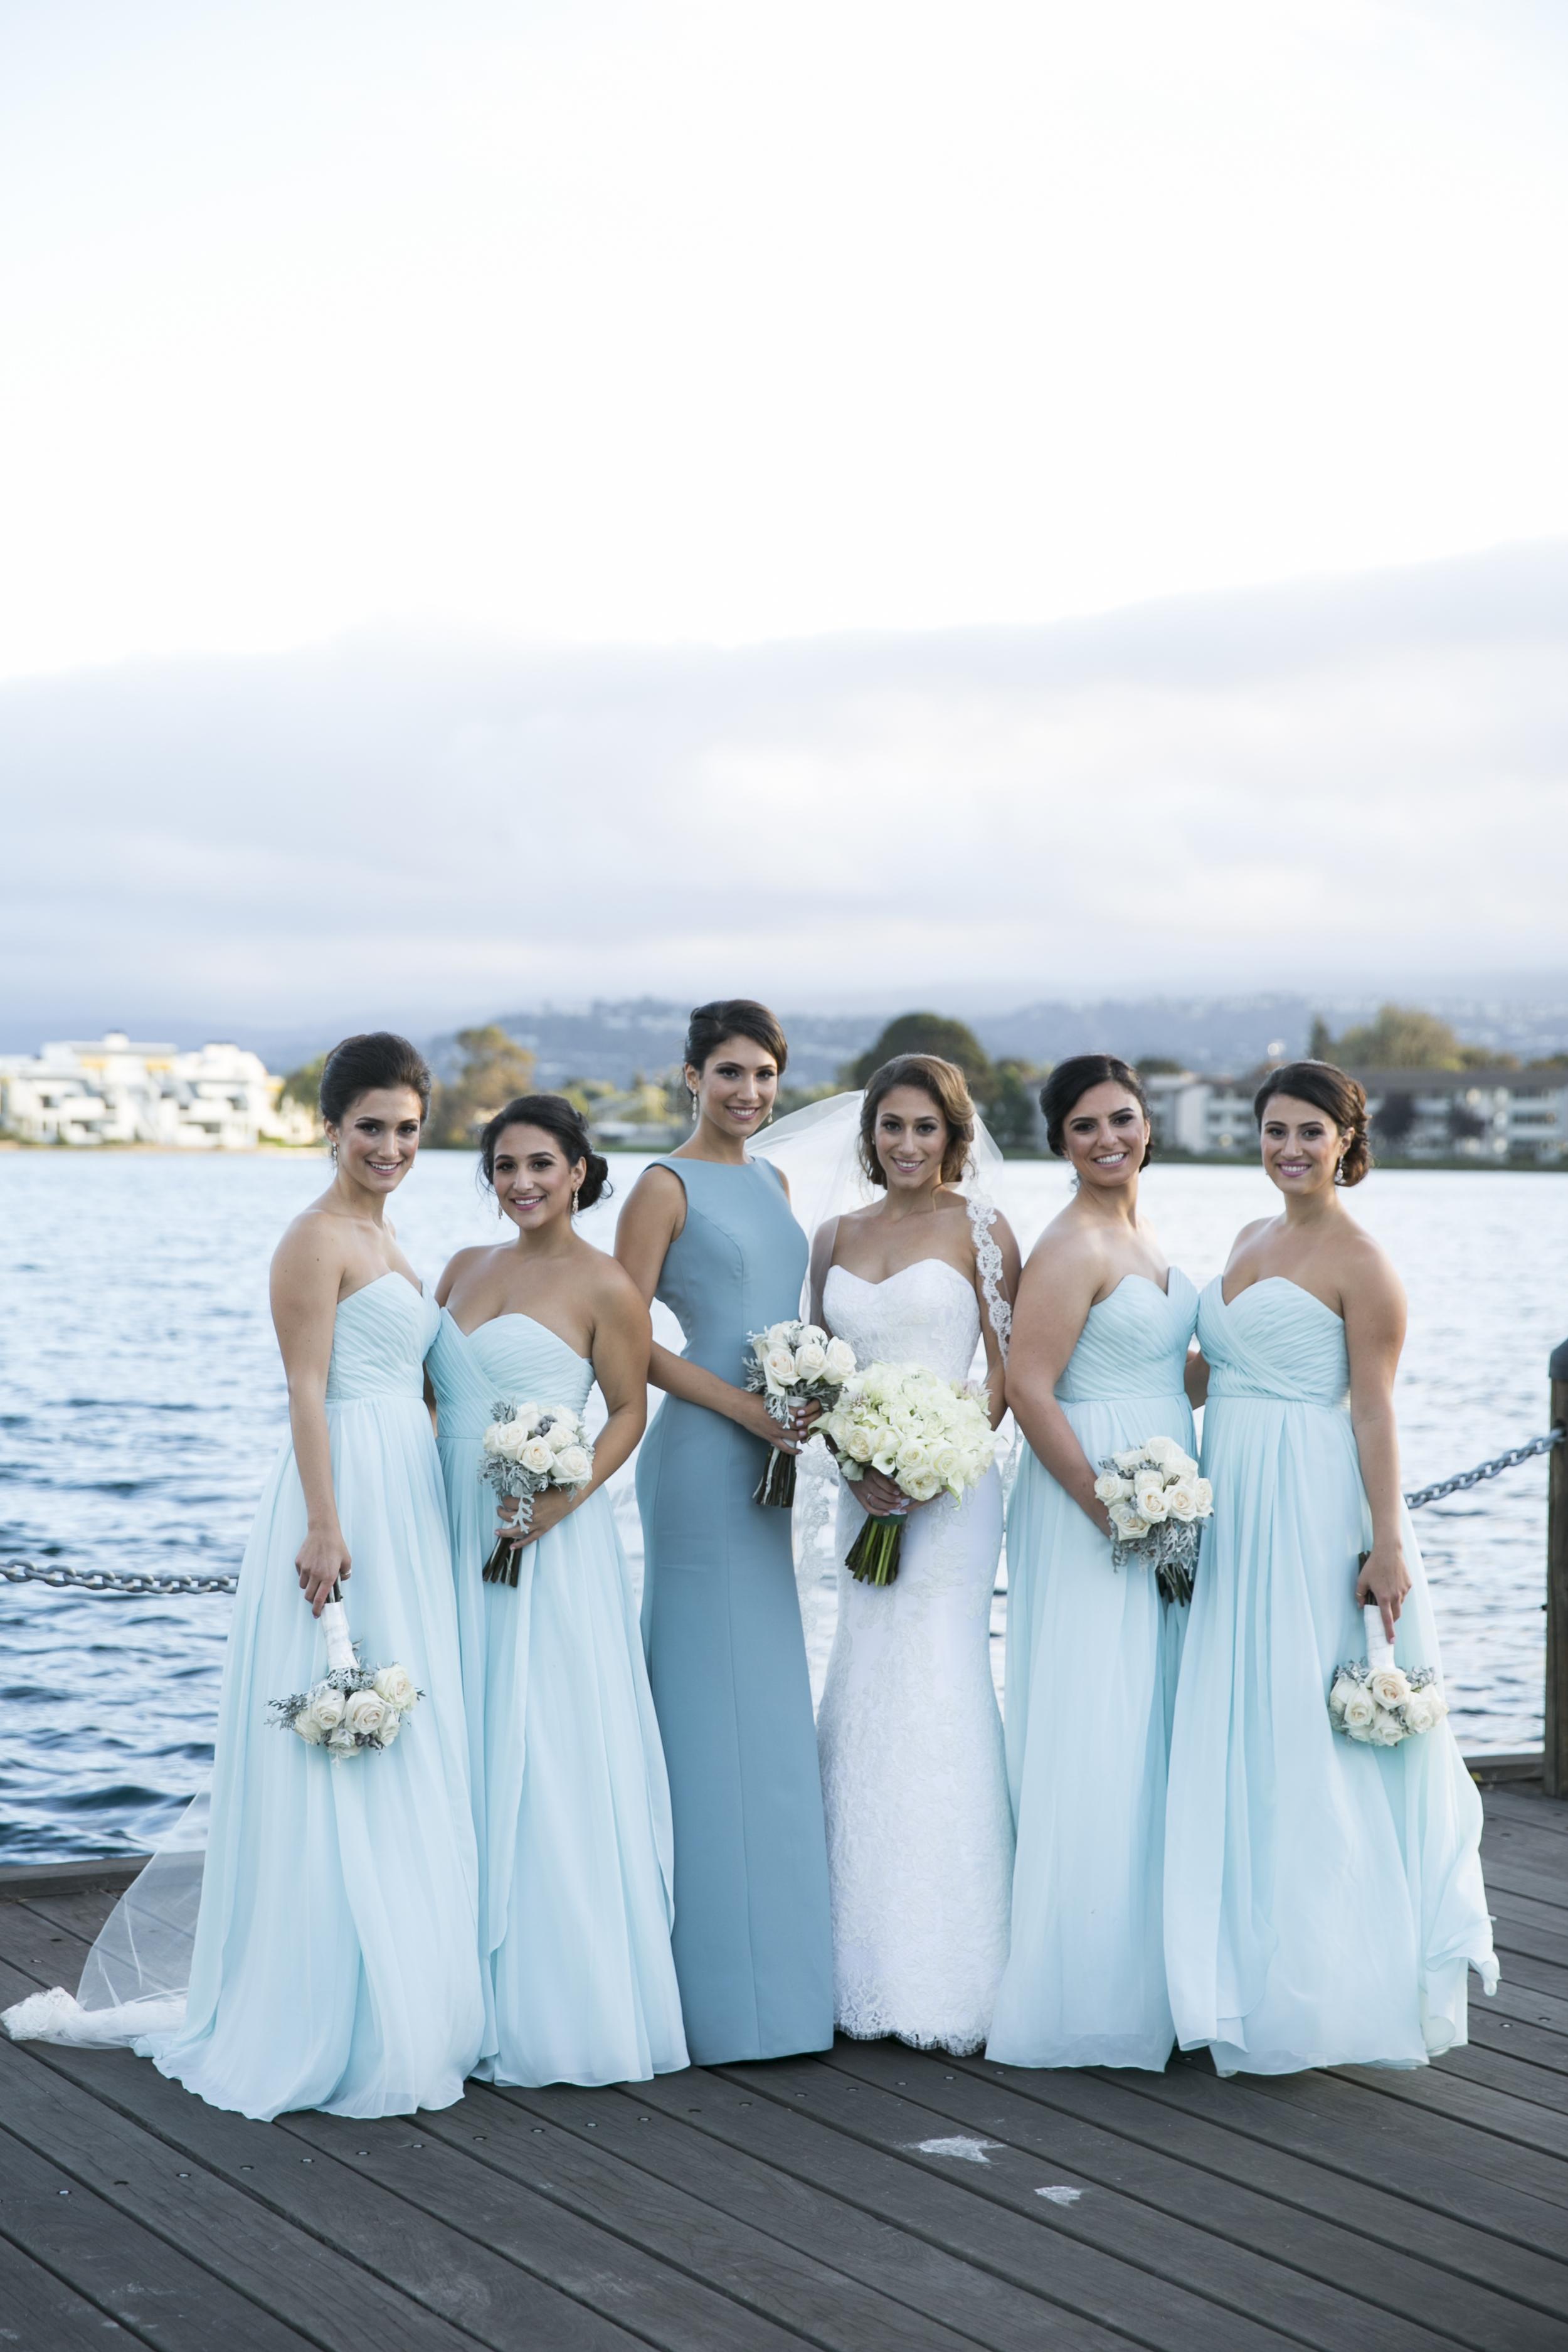 Persian Wedding-South San Francisco-Meo Baaklini24.jpg